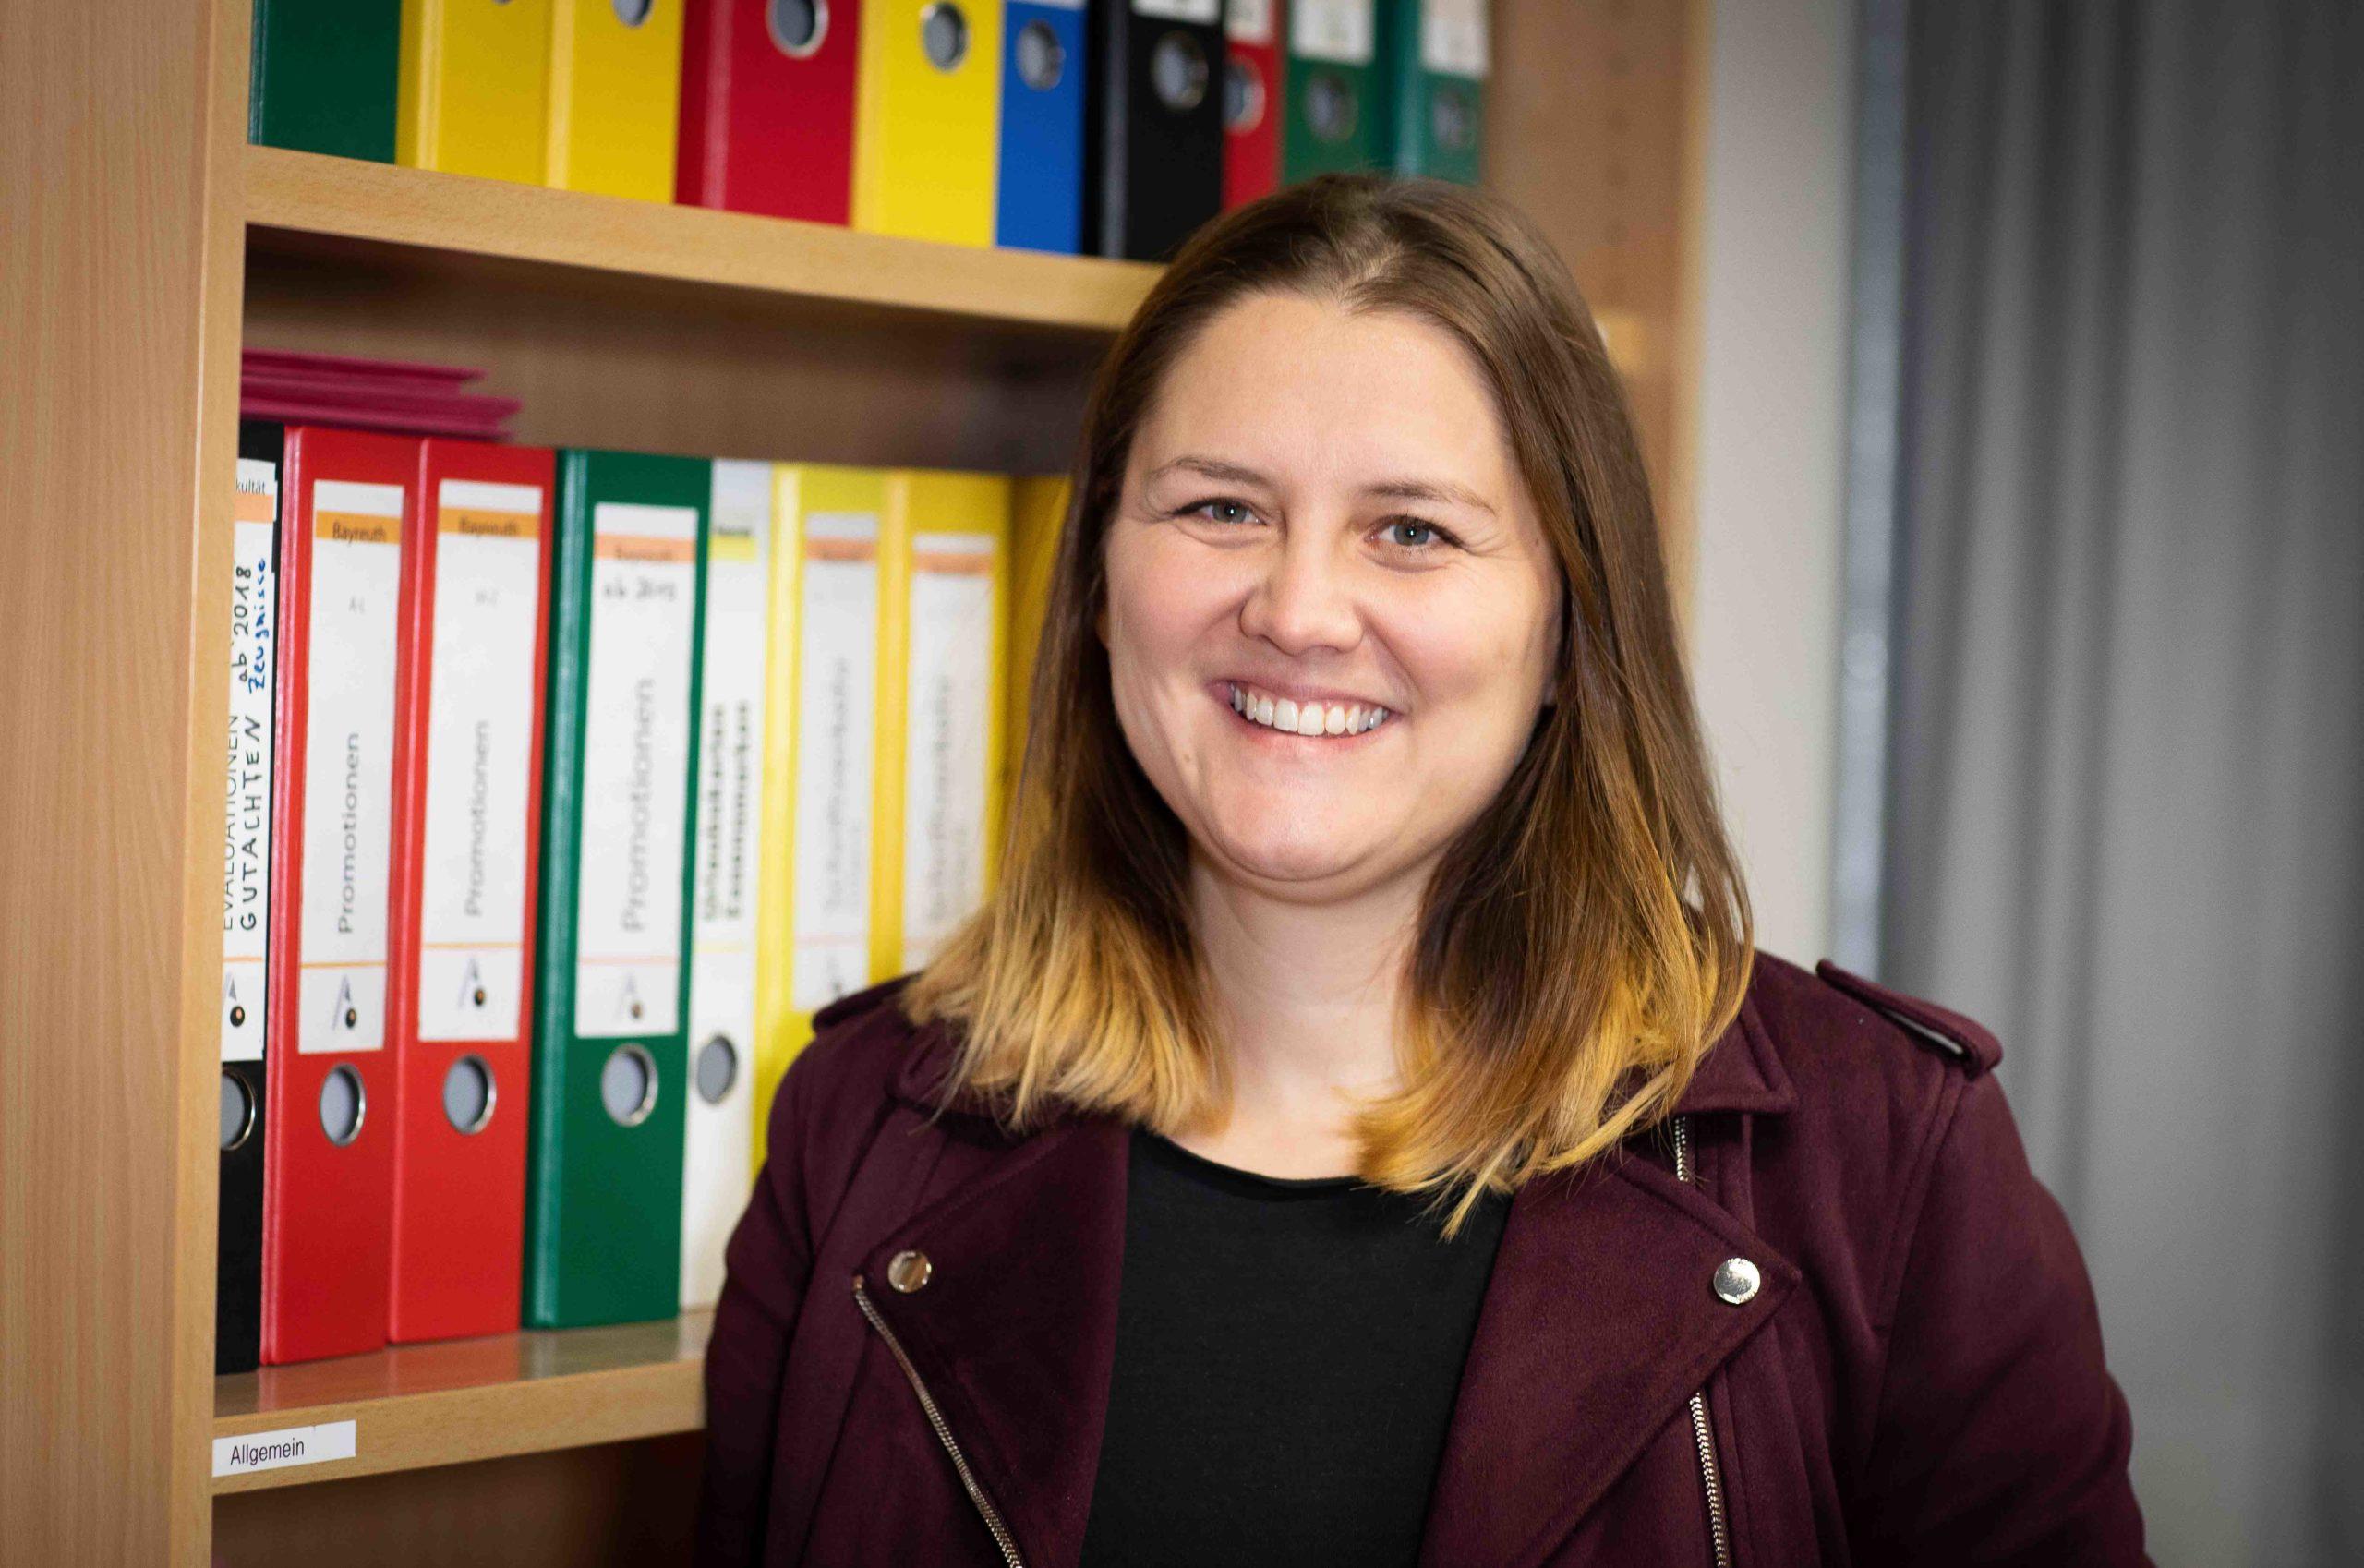 Kerstin Mosig | Polymer Engineering Bayreuth